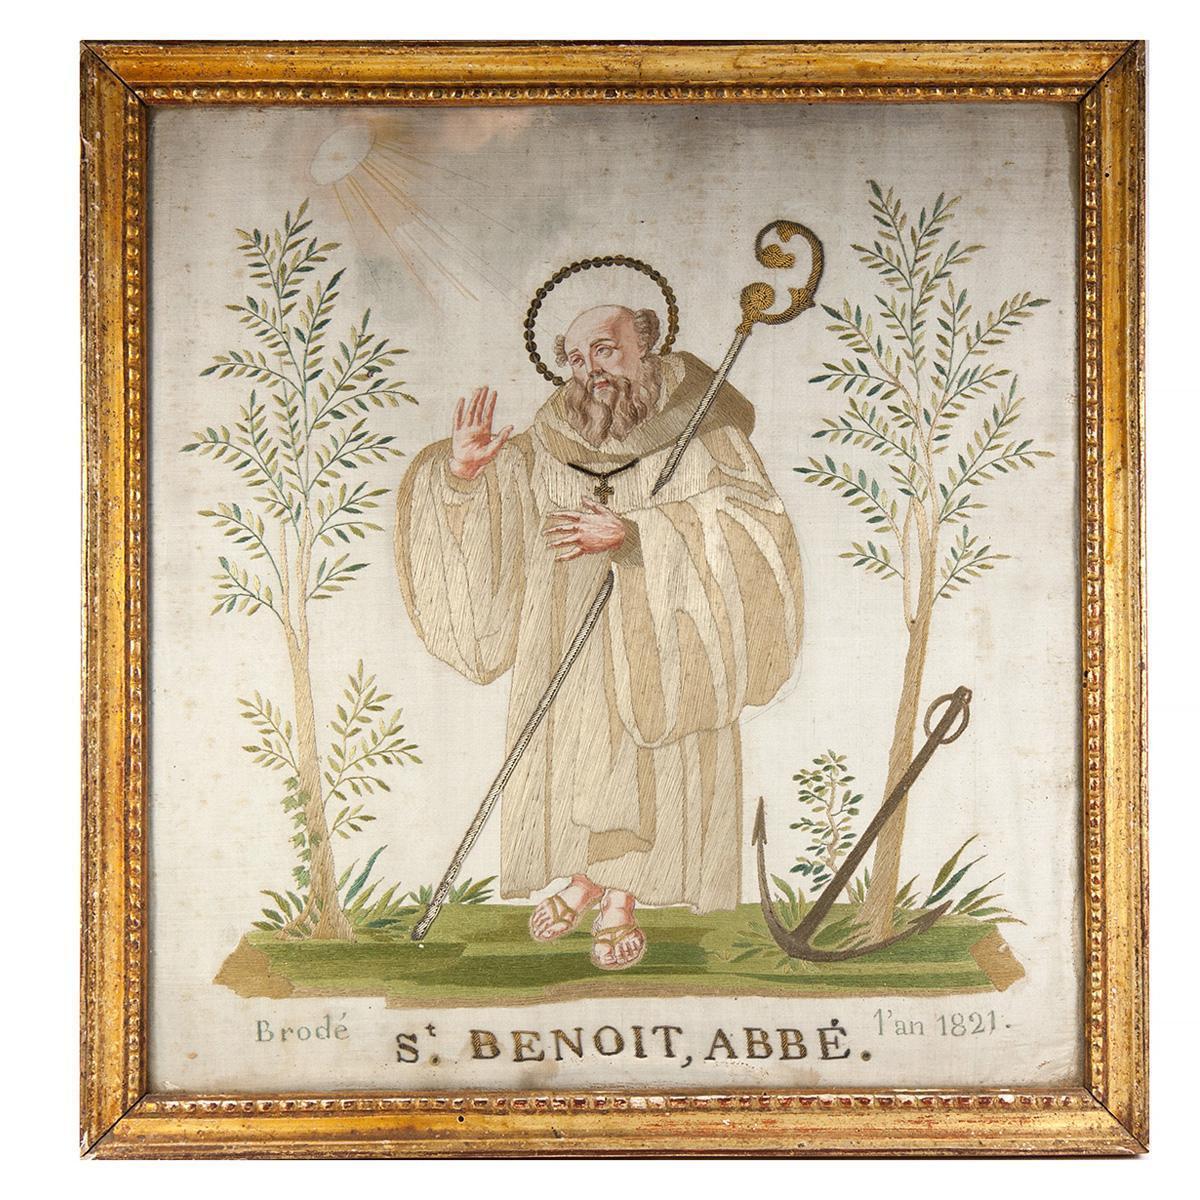 RARE c.1821 Napoleonic Silk on Silk Embroidery Sampler #2 in Frame, St. Benoit, Abbe